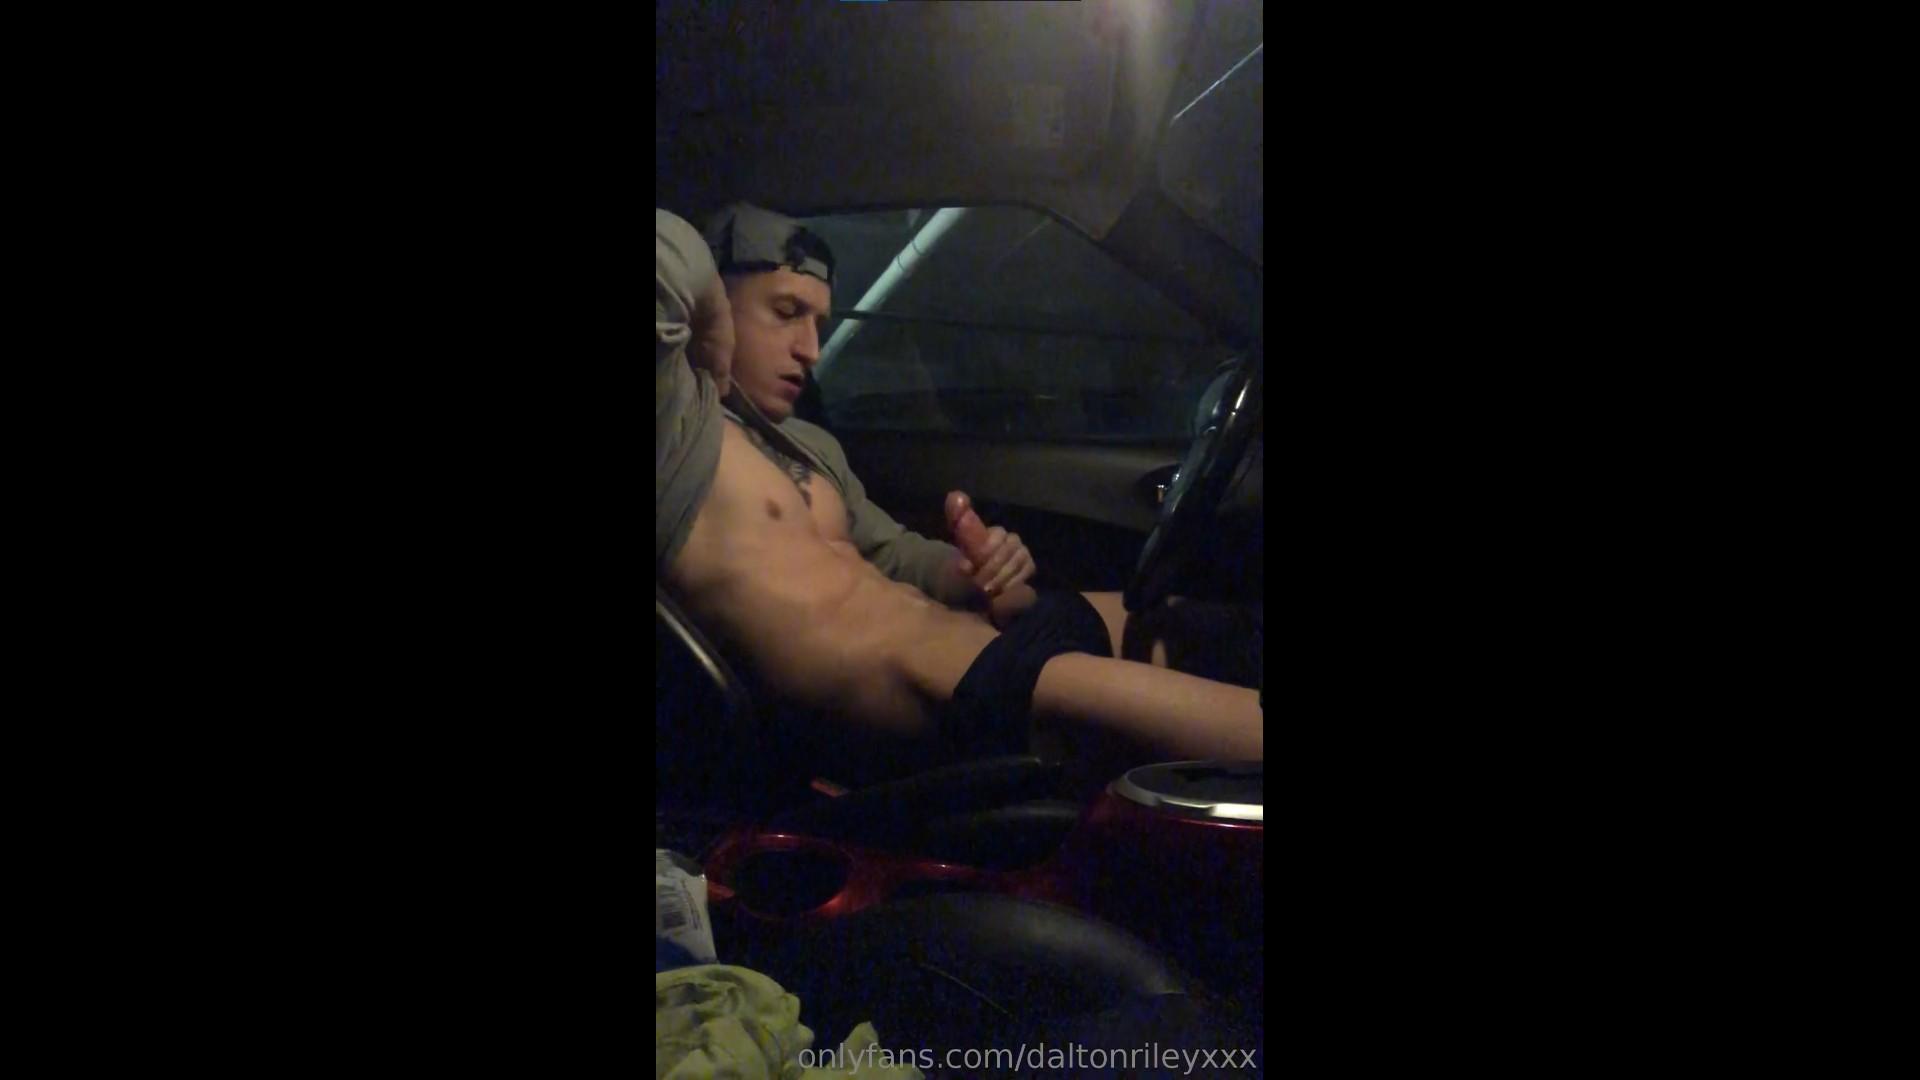 Jerking off in my car and cumming over myself - Dalton Riley (DaltonRileyXXX)